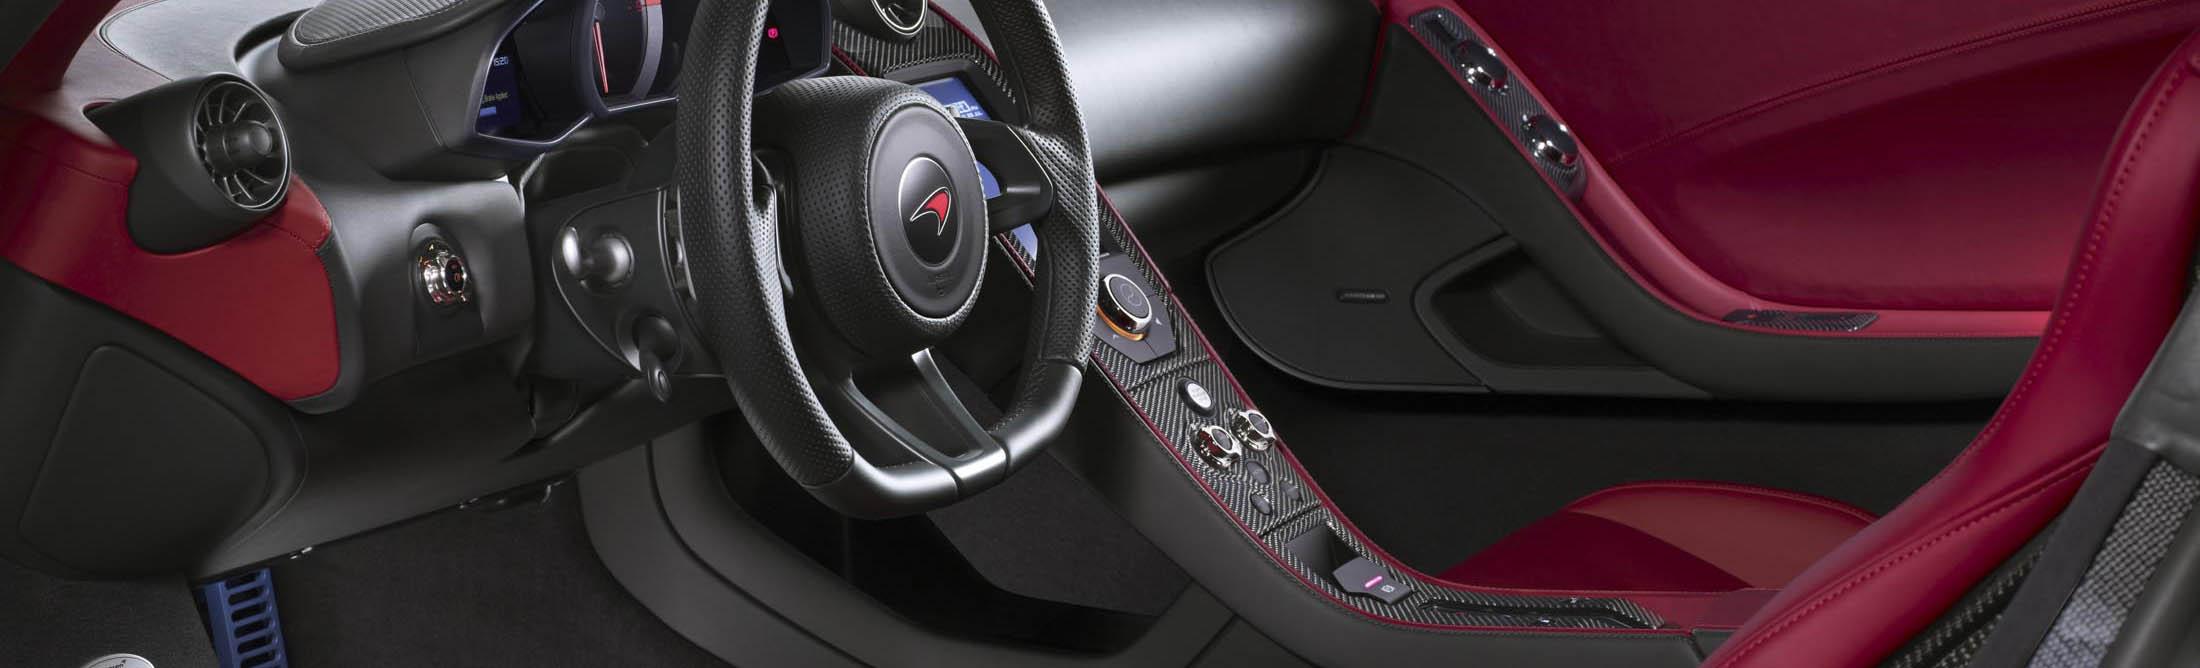 Asian dsg auto manual transmission